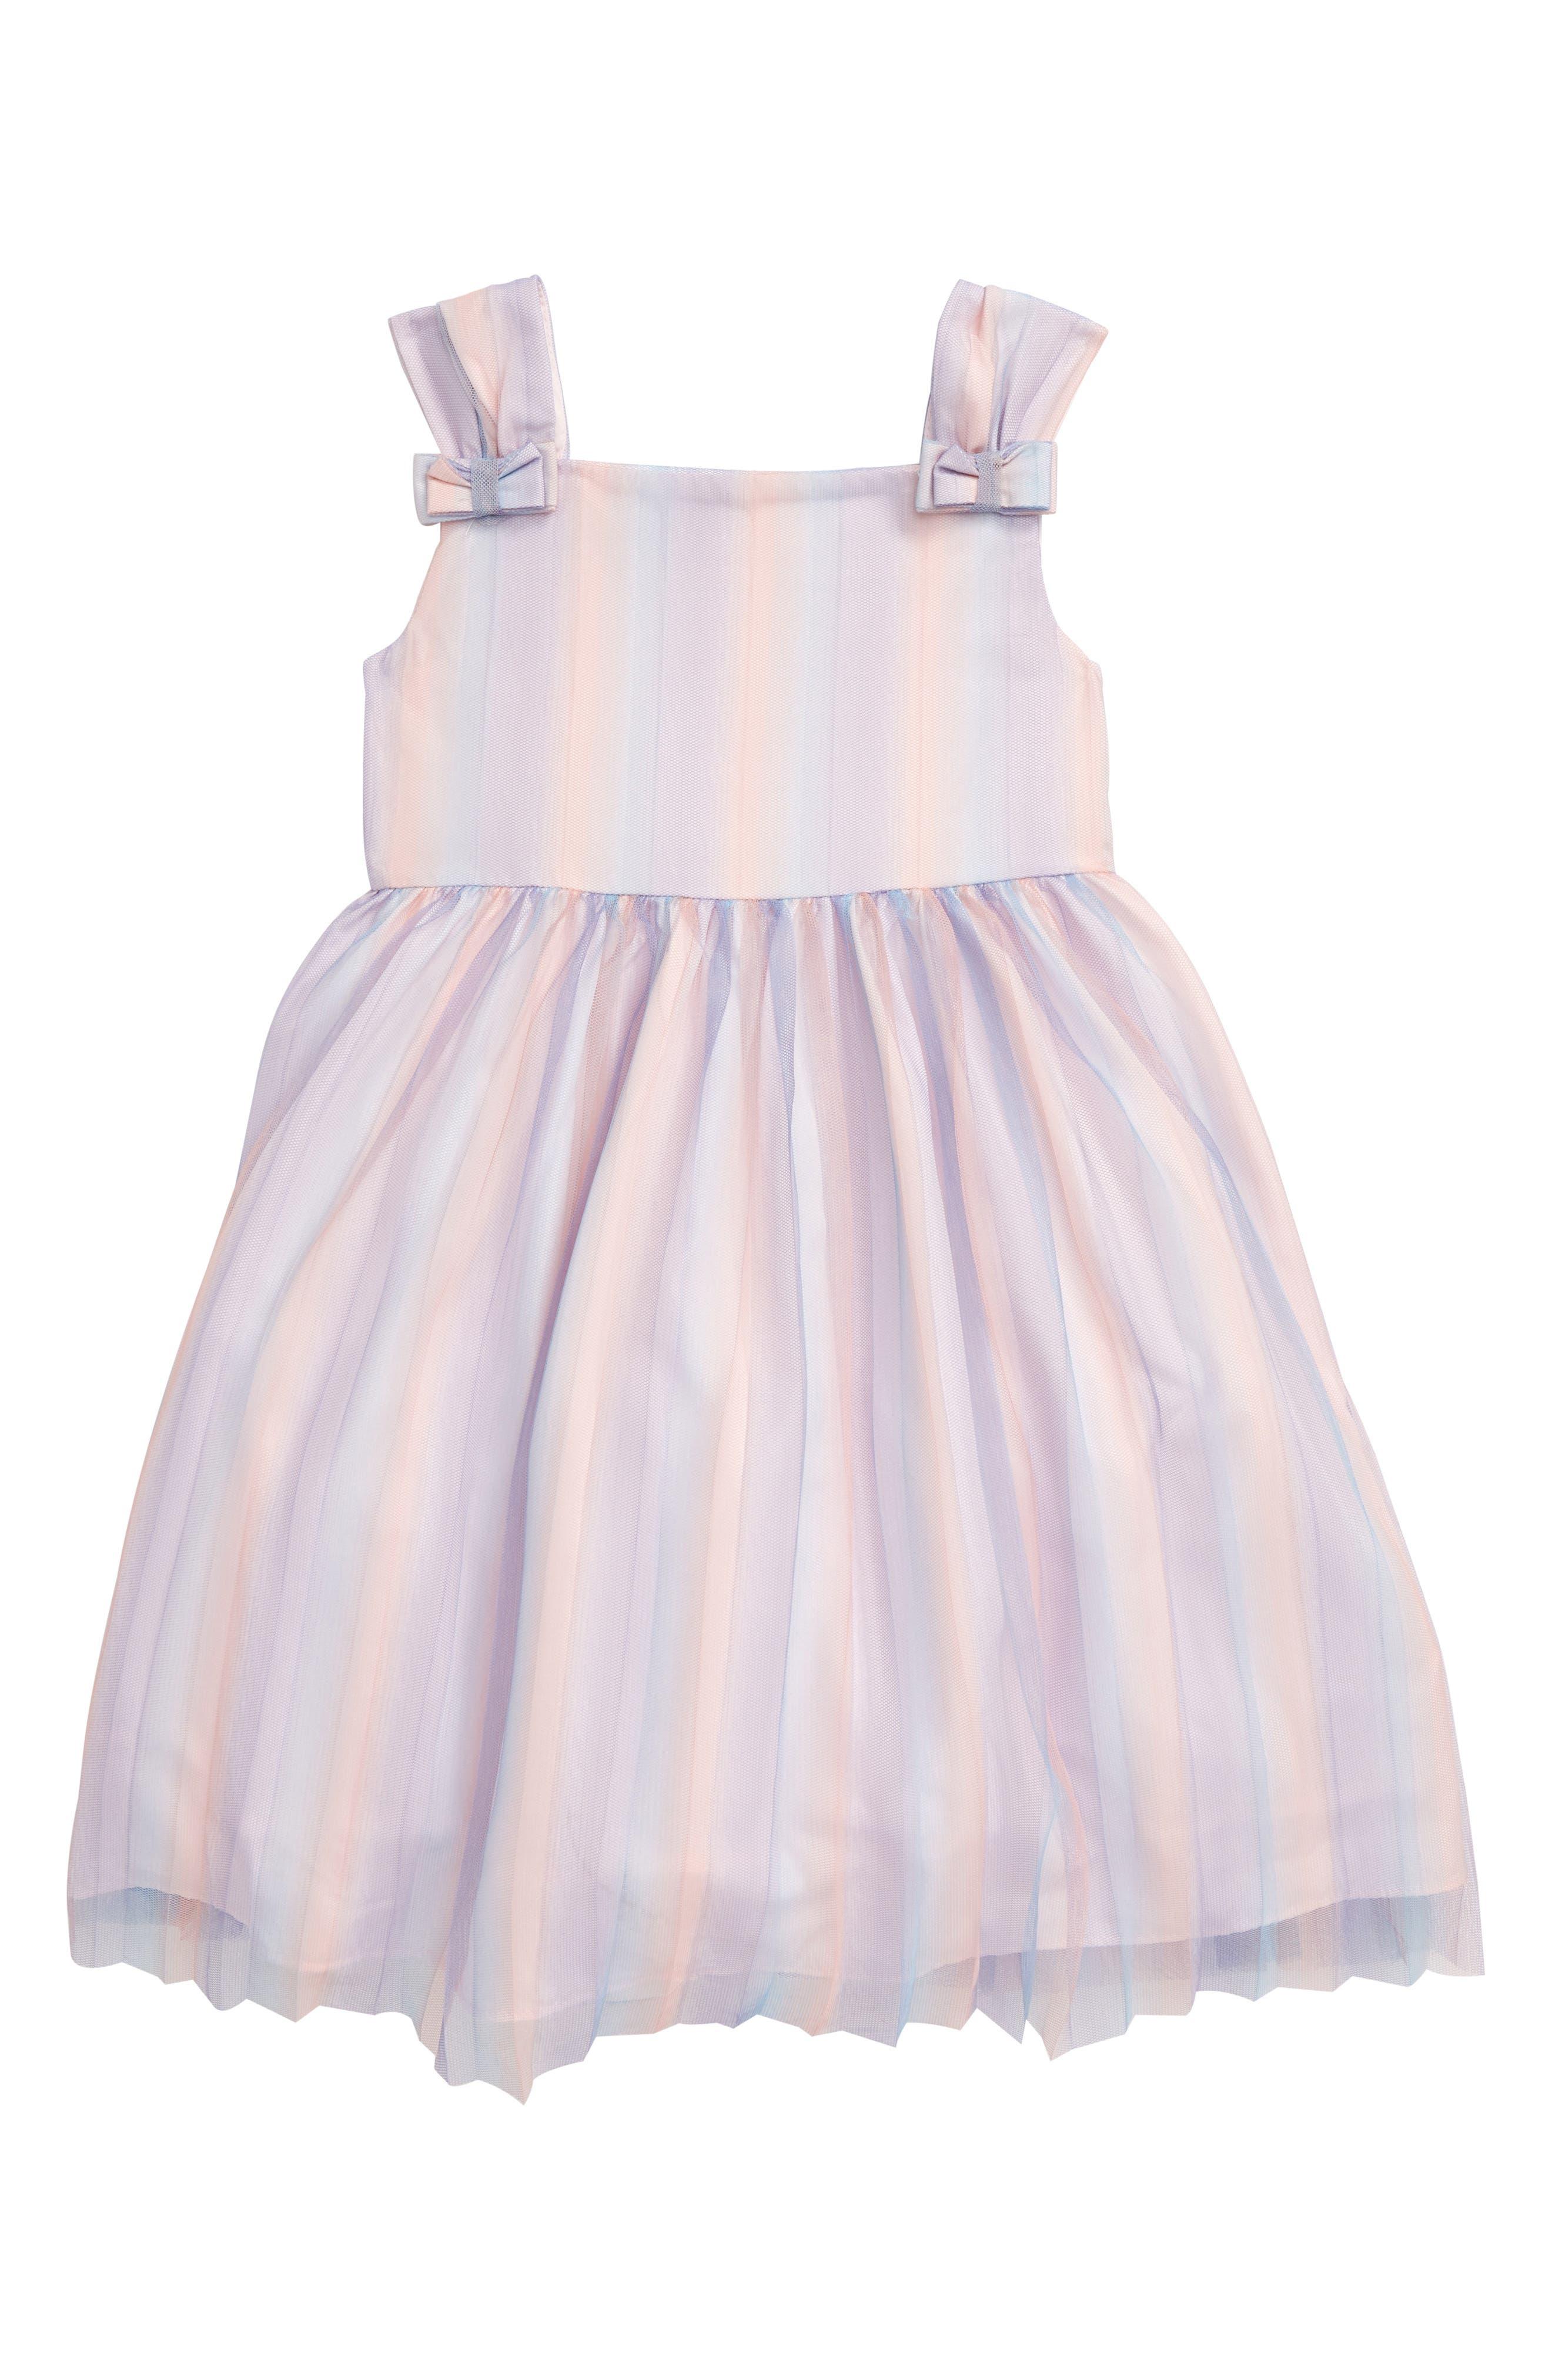 Bonds Girls Shortie 10-12 14-16 Great under skirt Blue Daisy or Pink Striped